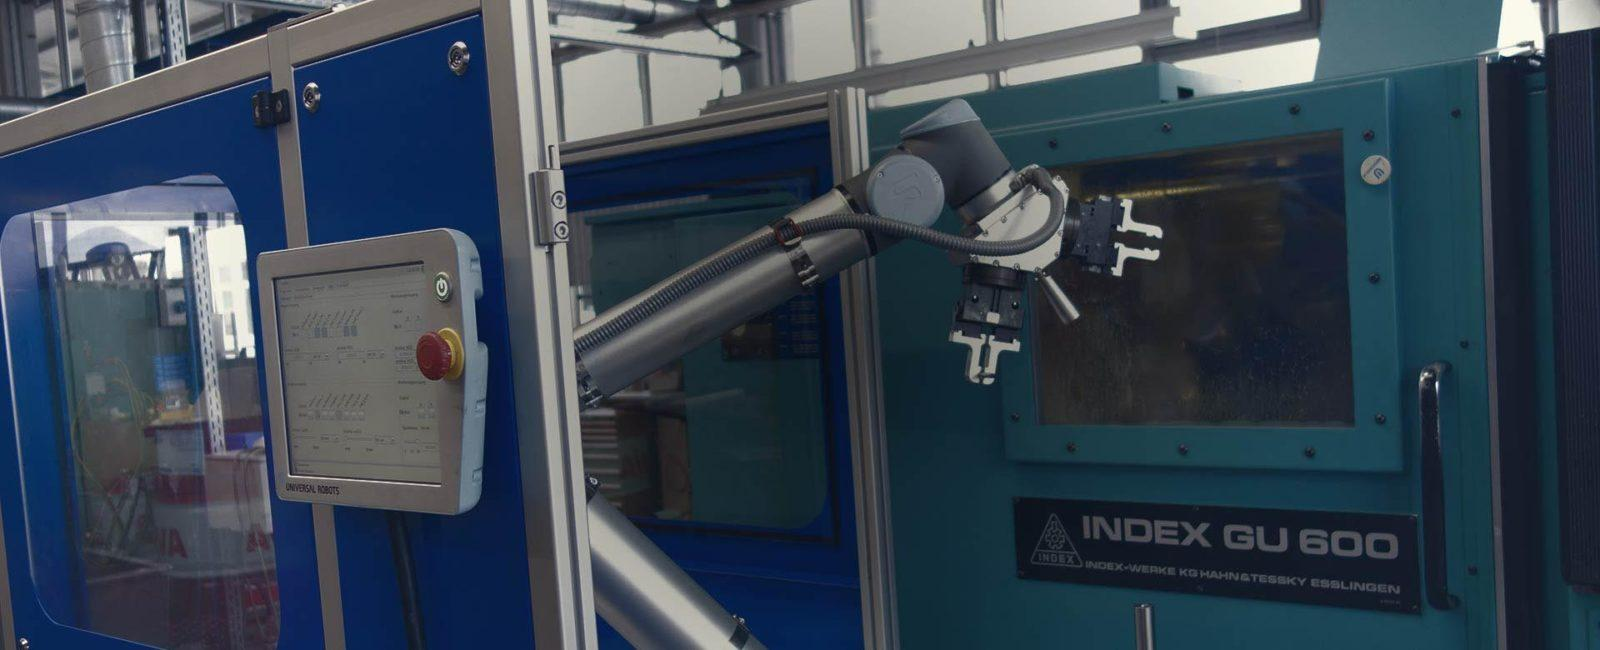 sistemas de control automatico-cobots robotica bcolaborativa